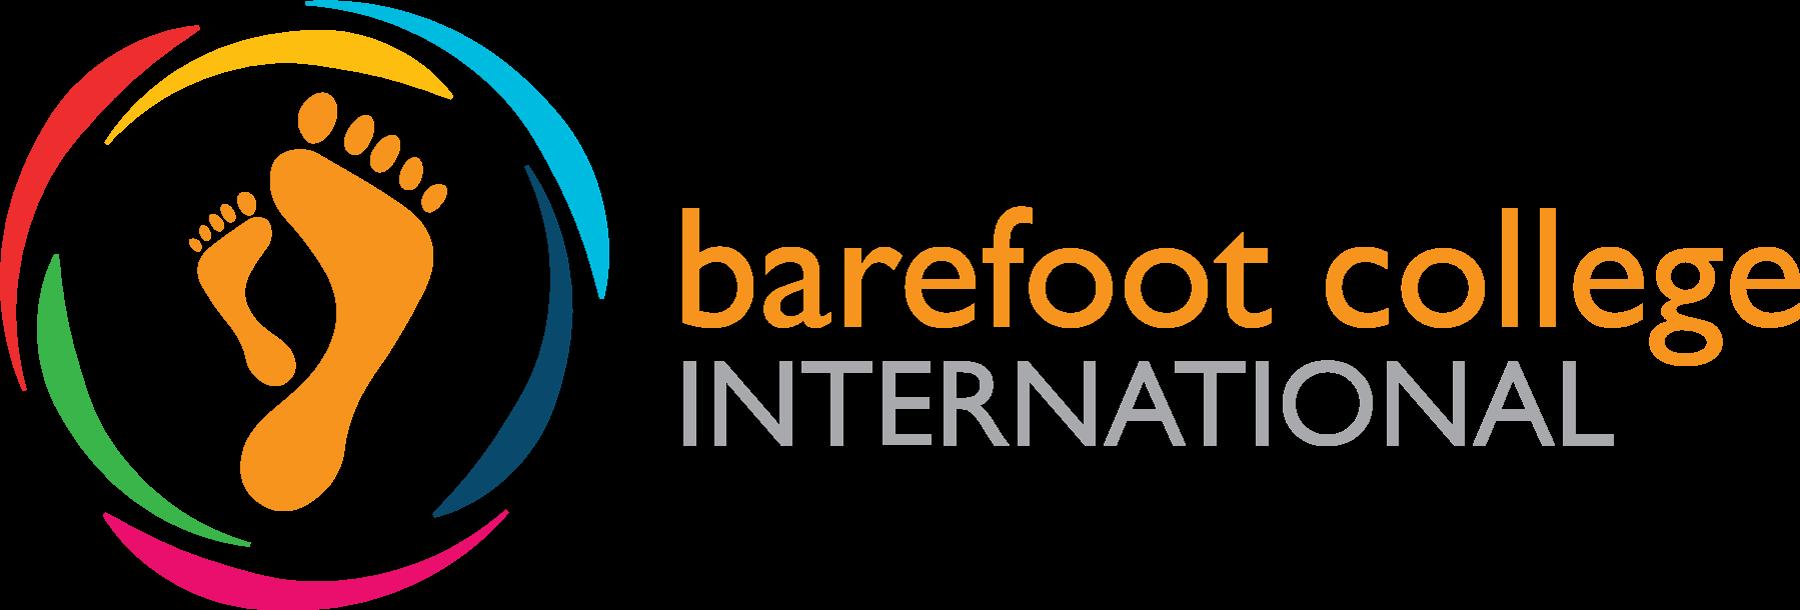 Barefoot College International